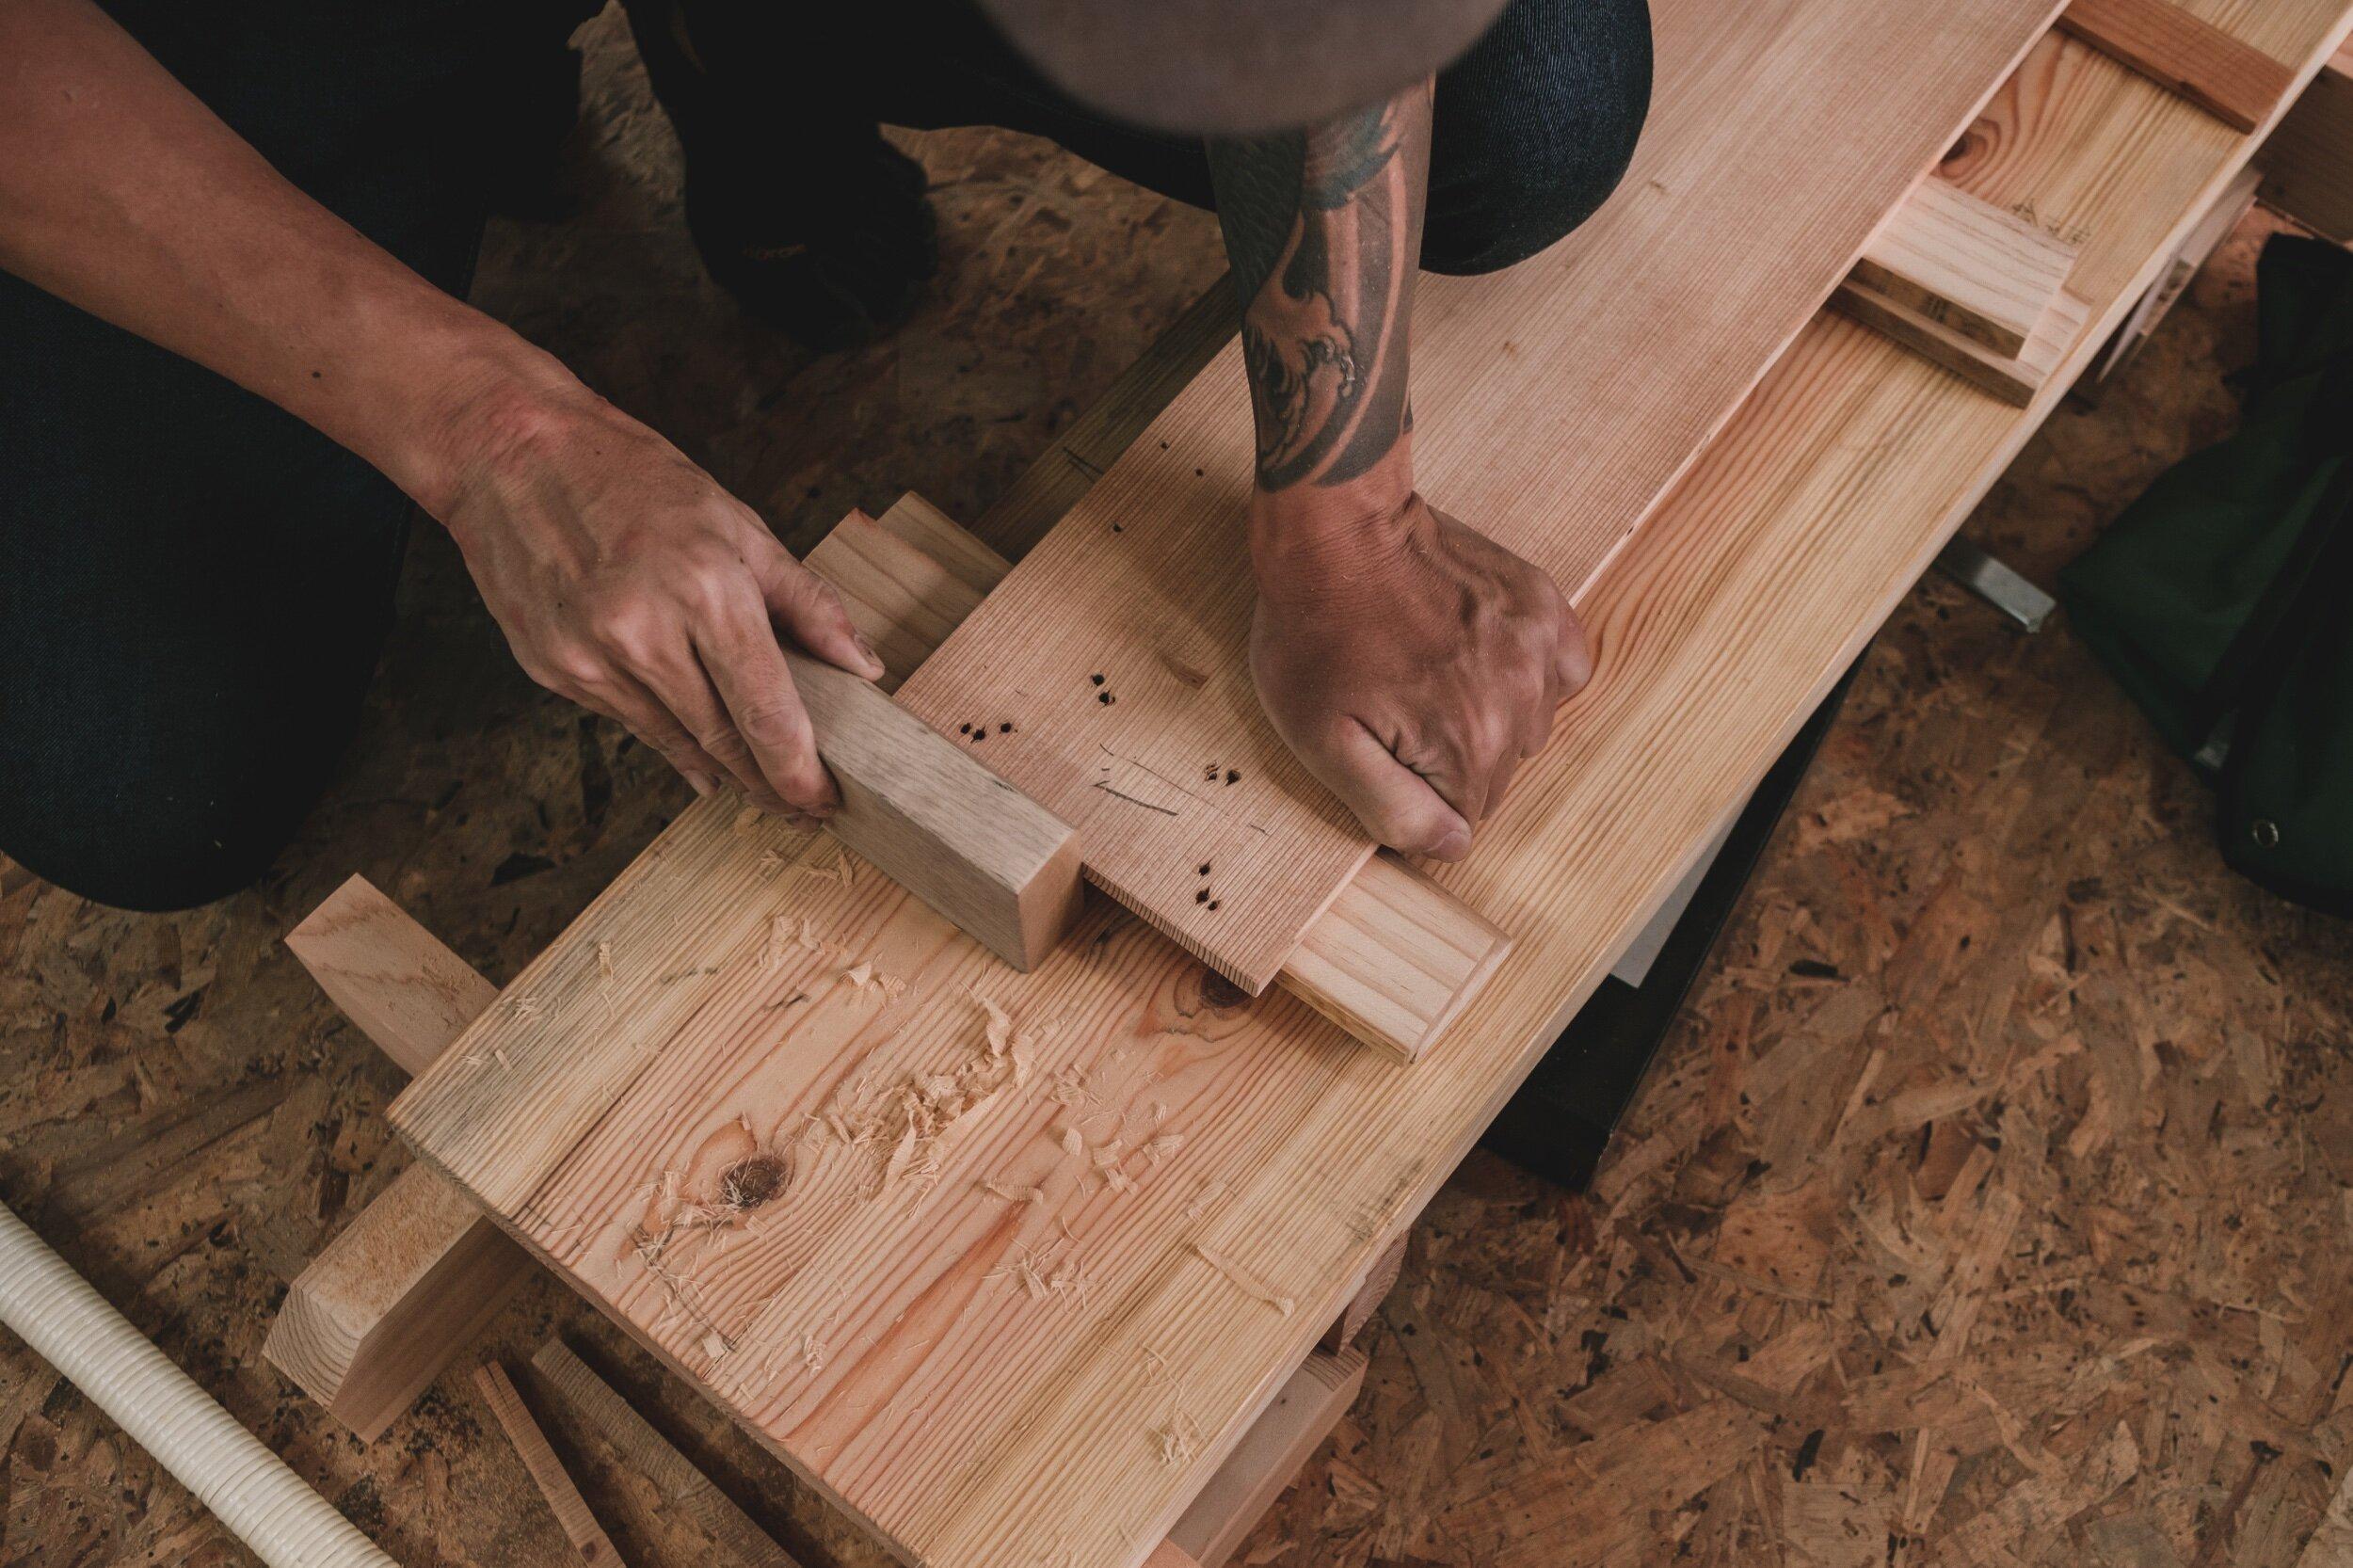 Woodcraft Course Beginner Shokunin Mokko Wood Studio